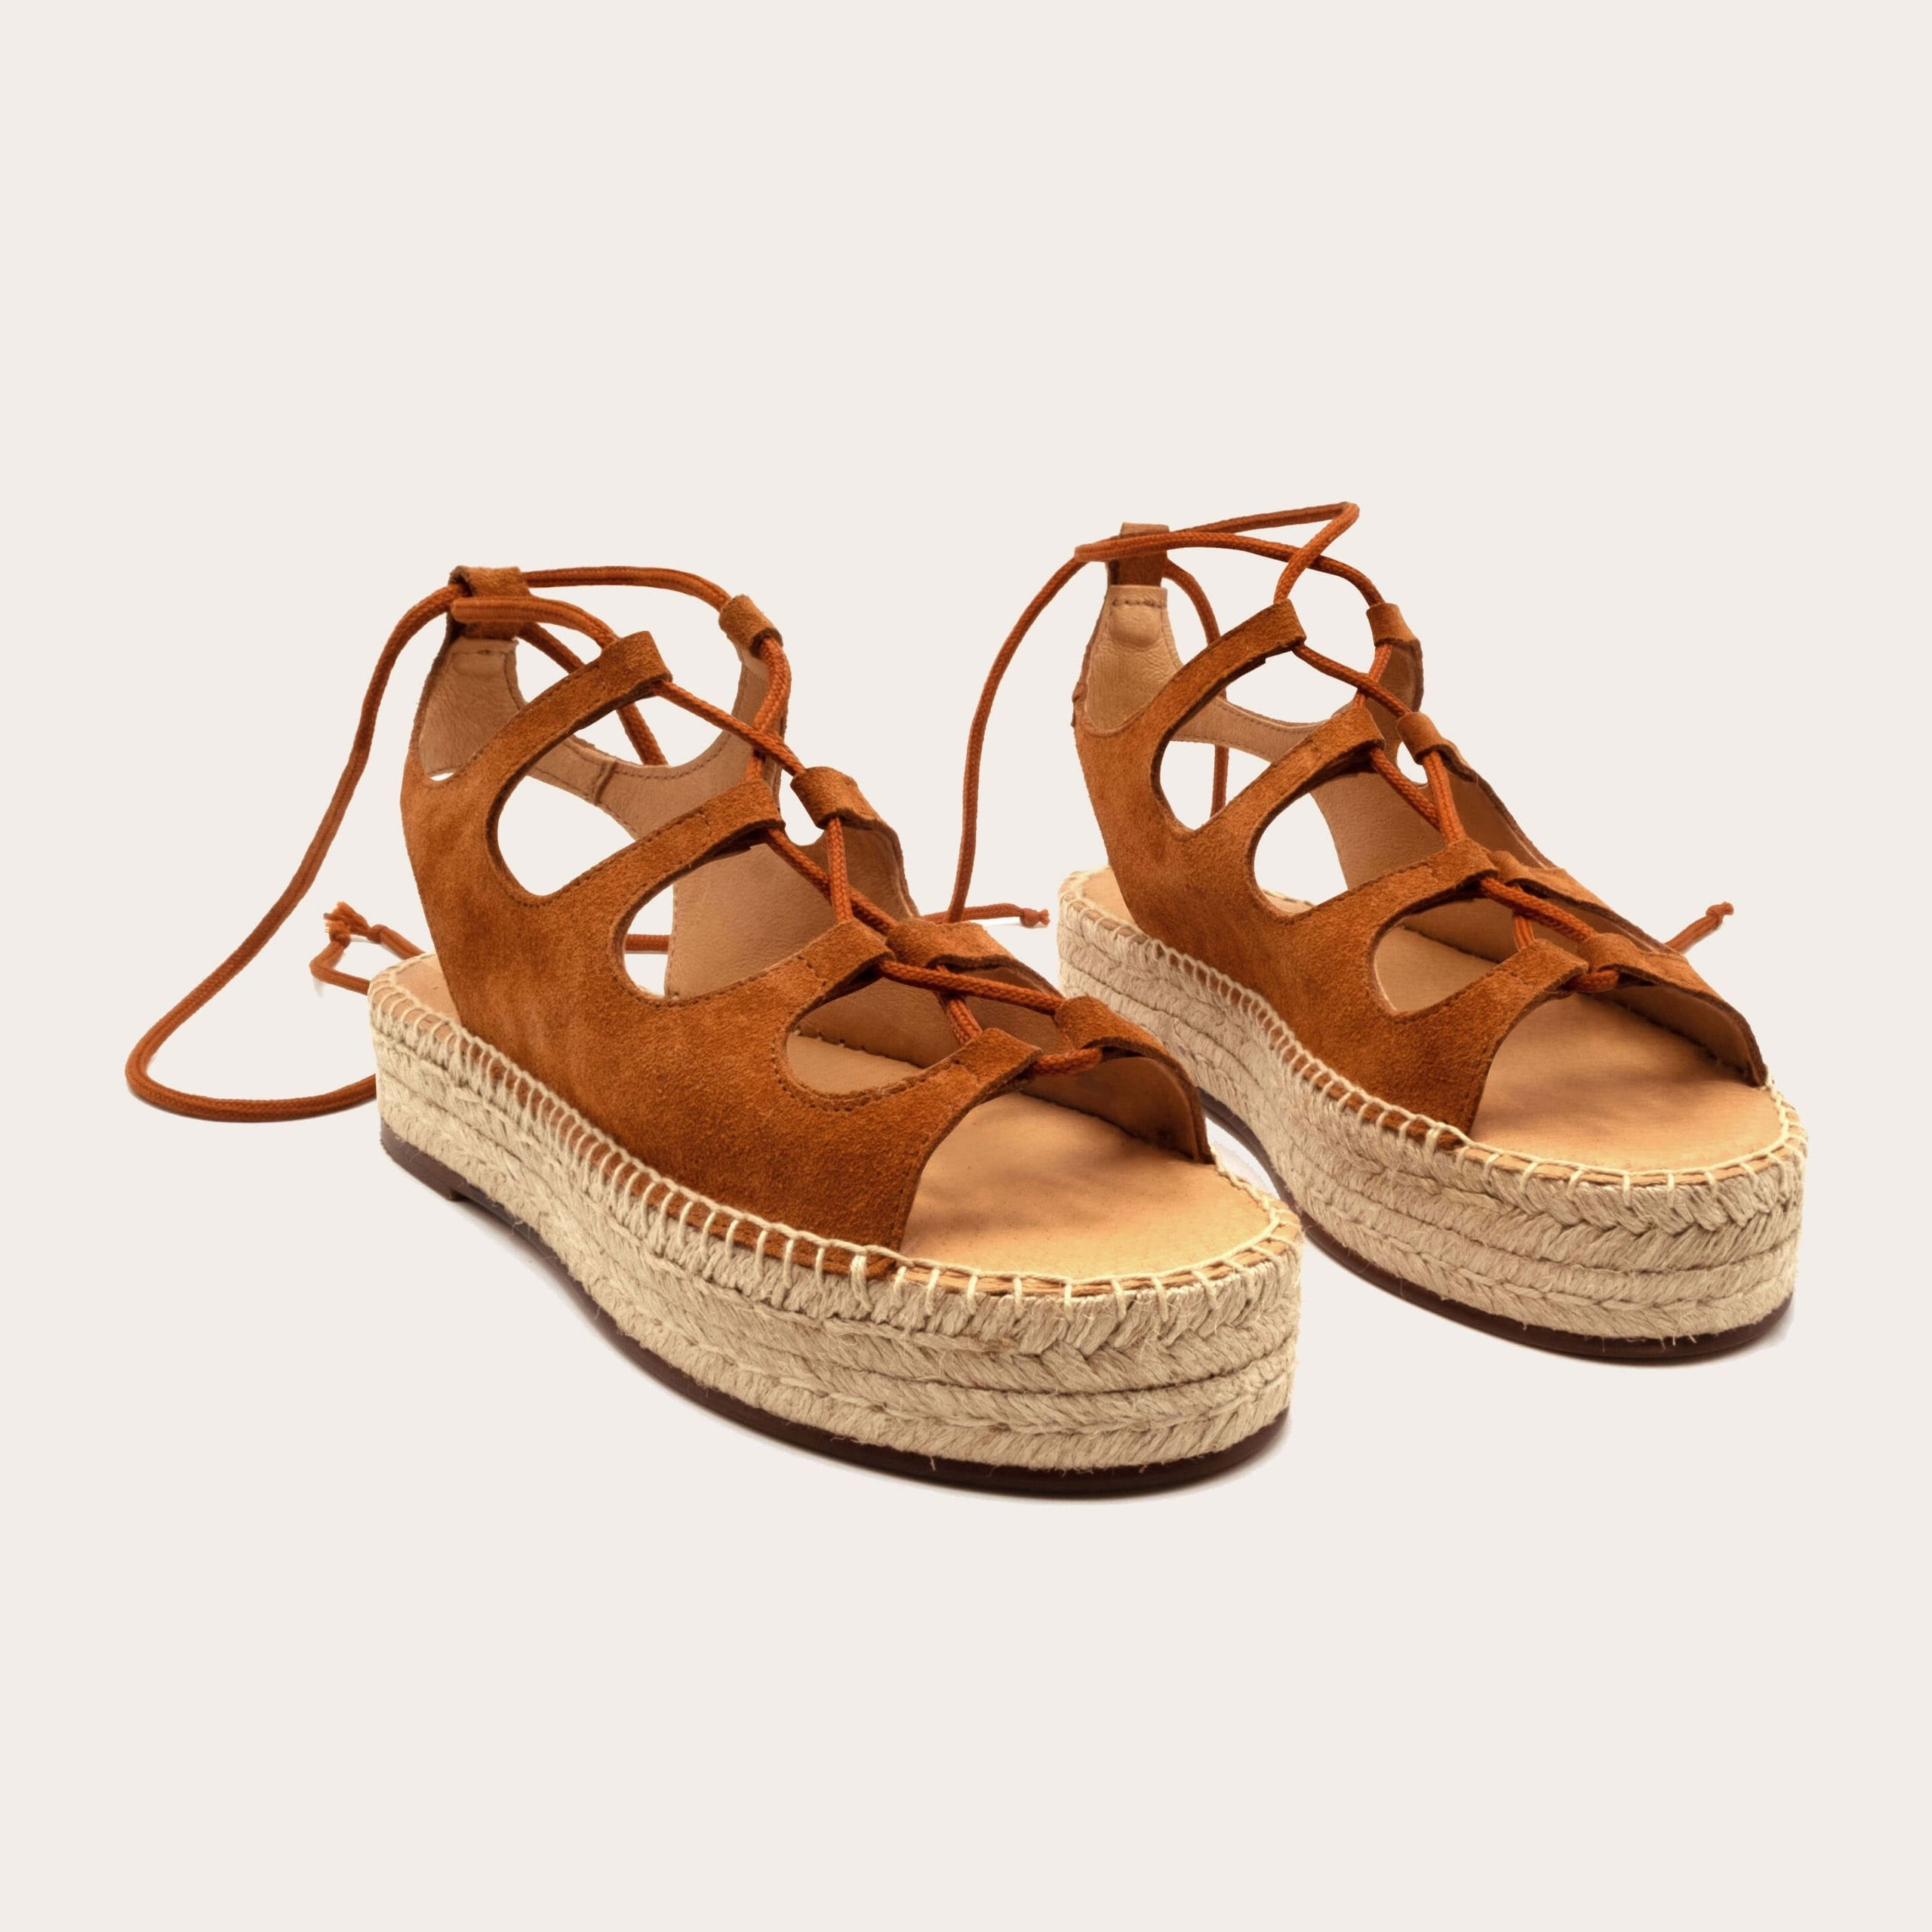 rafa-brown_2_lintsandalen sandals travelsandals vegan sustainable sandals wikkelsandalen